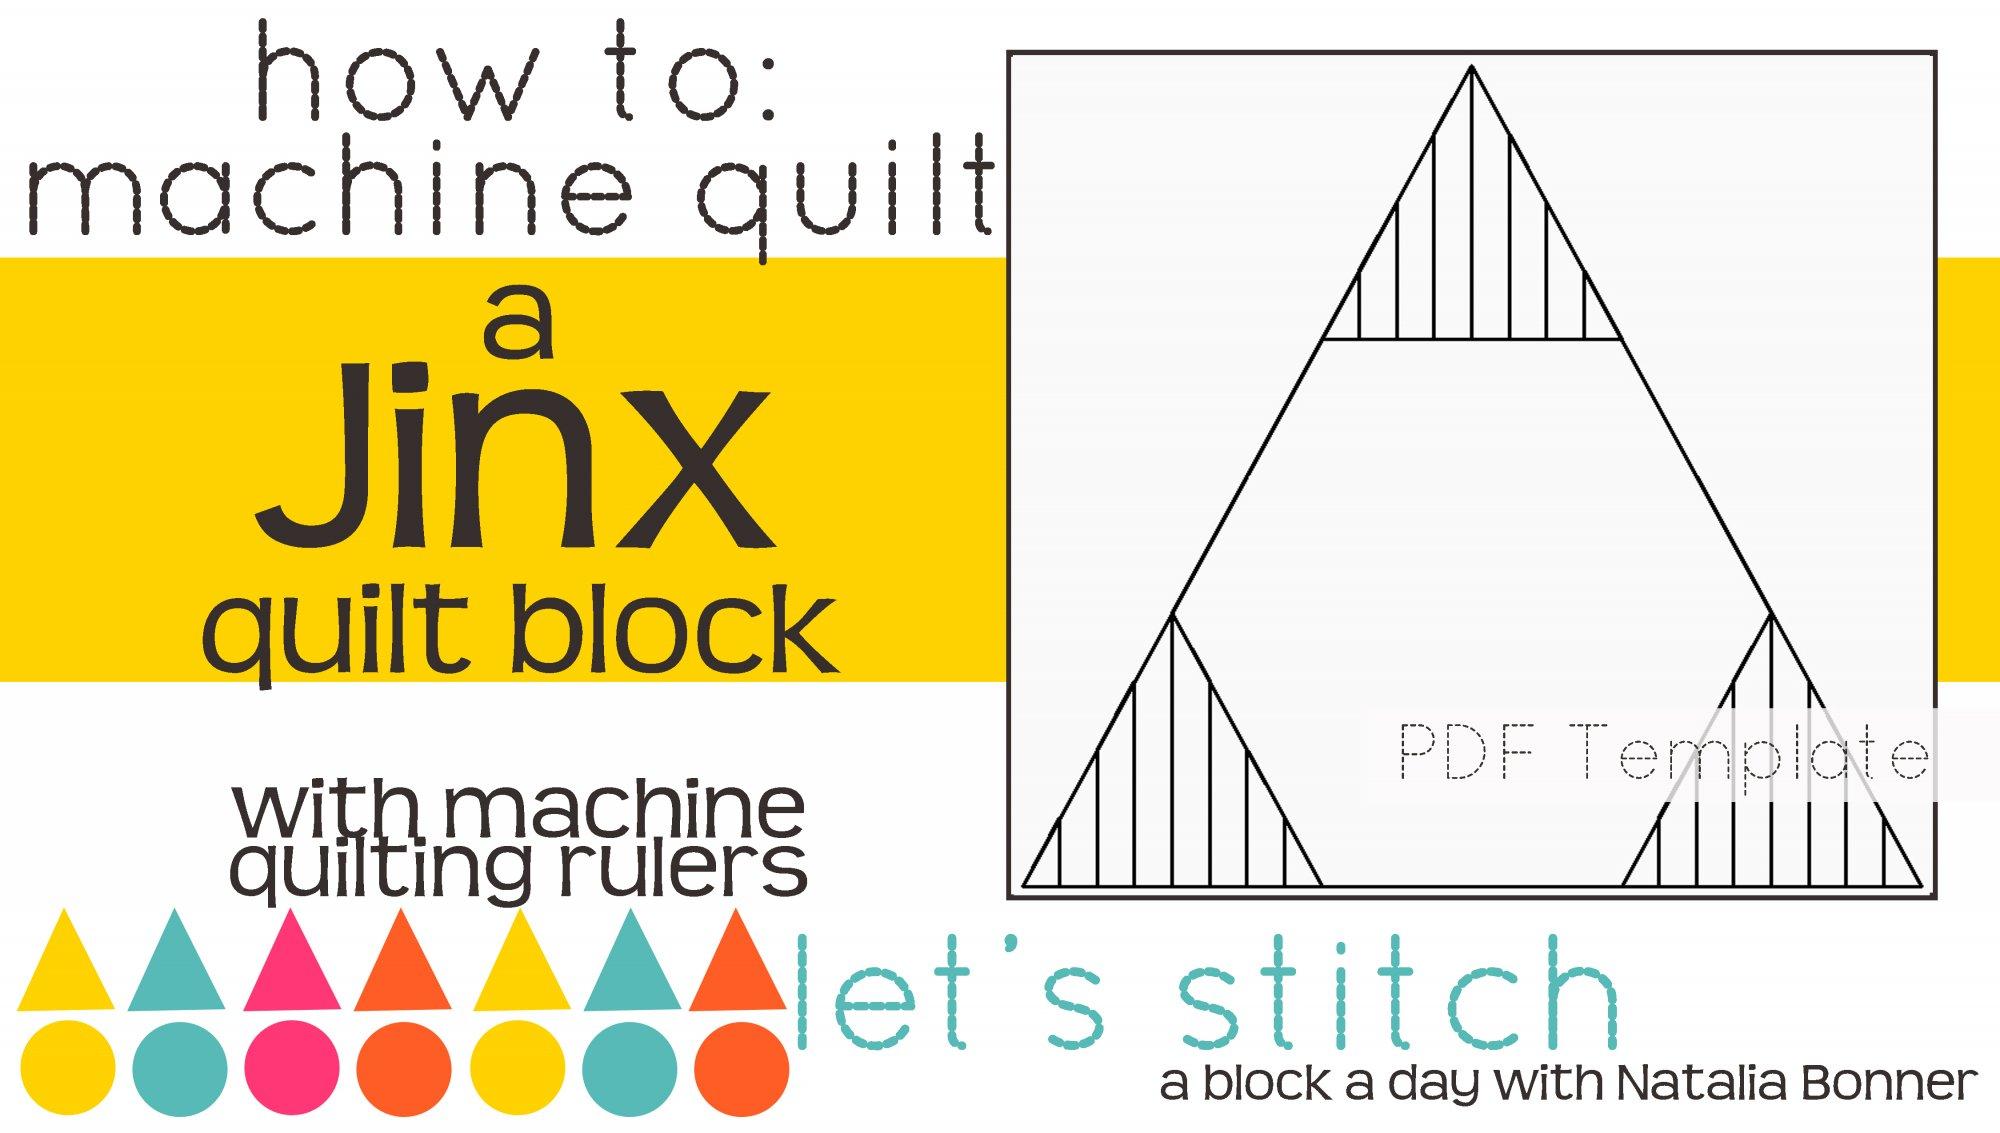 Let's Stitch - A Block a Day With Natalia Bonner - PDF - Jinx